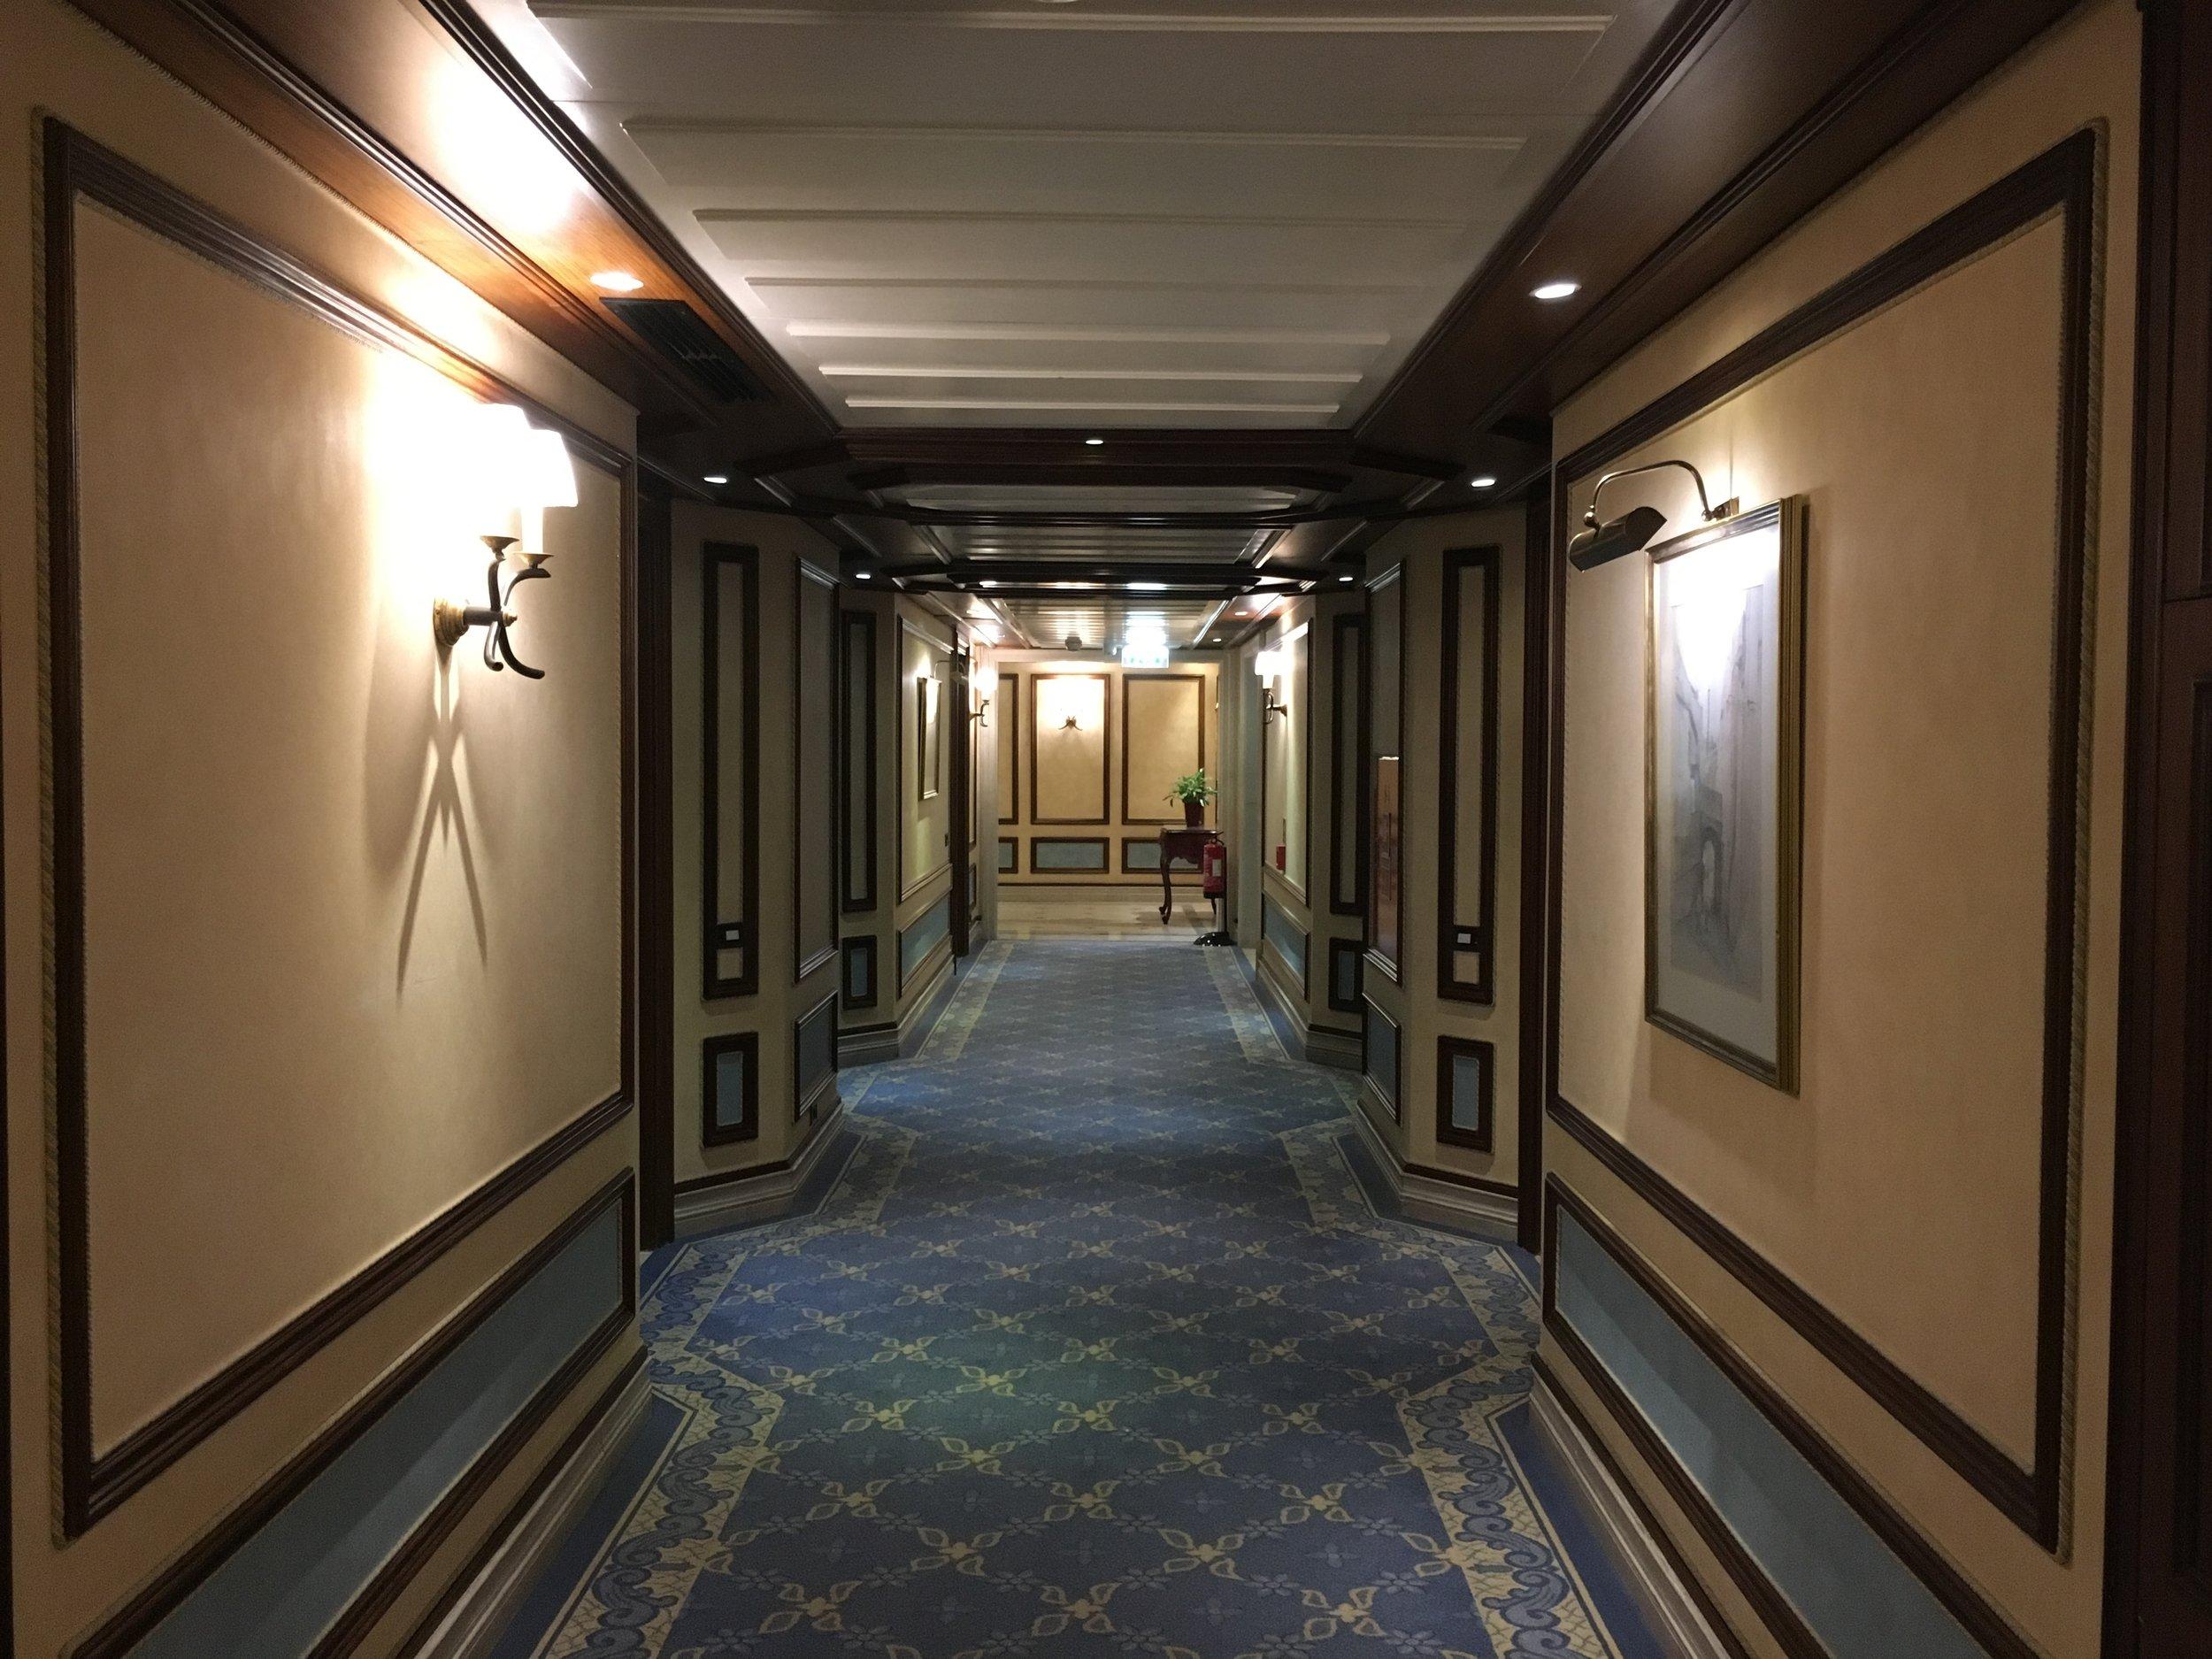 Olissippo Lapa Palace Hotel Hallway - Palace Wing